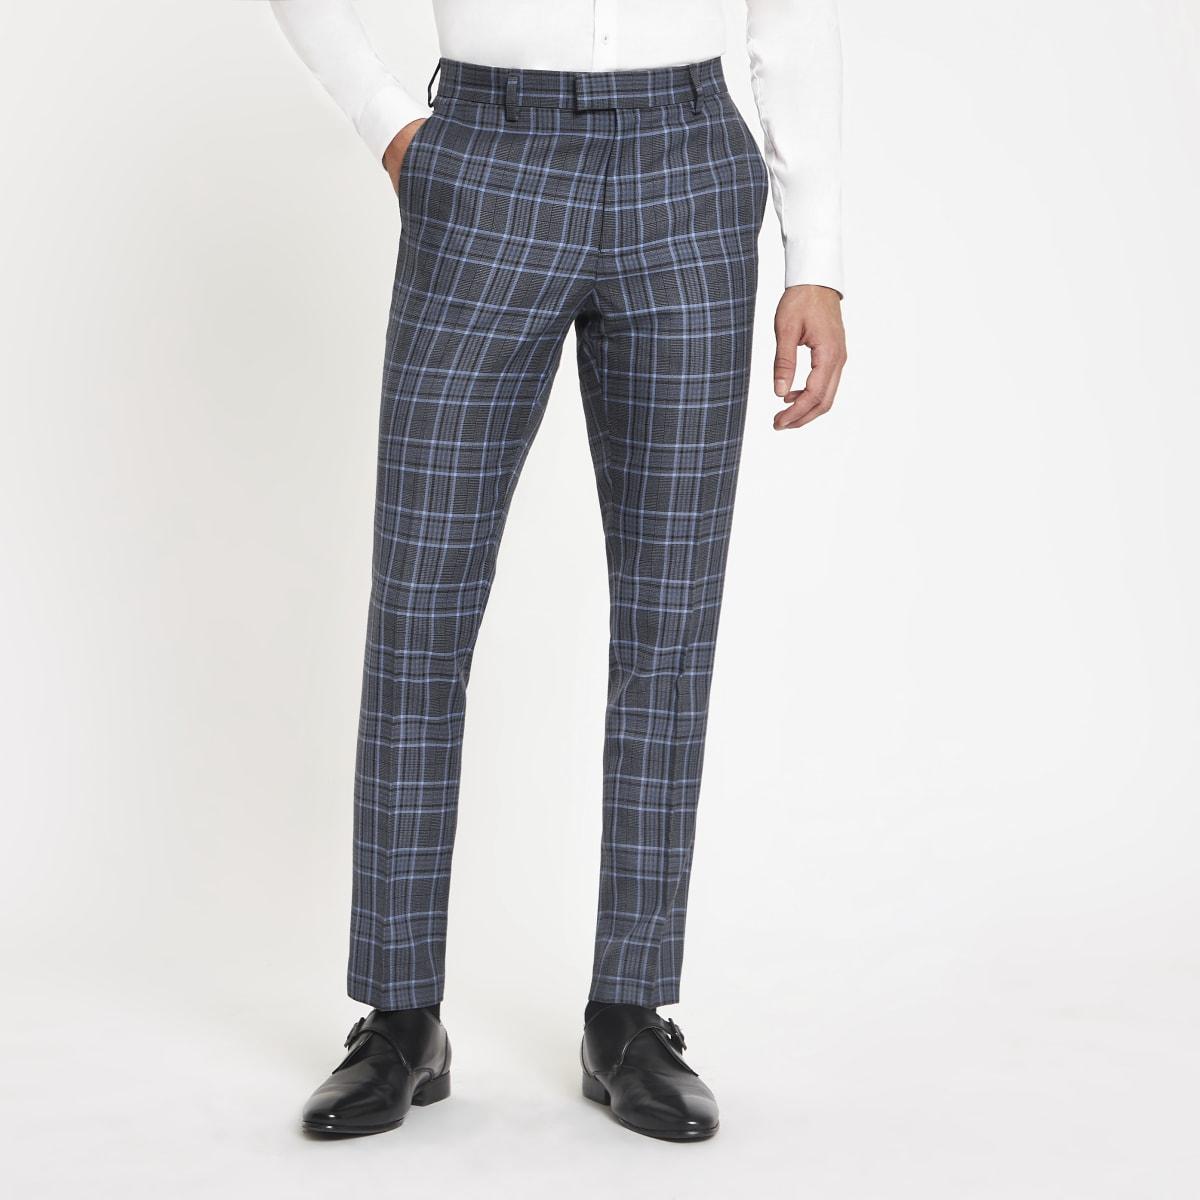 Felblauwe geruite skinny pantalon